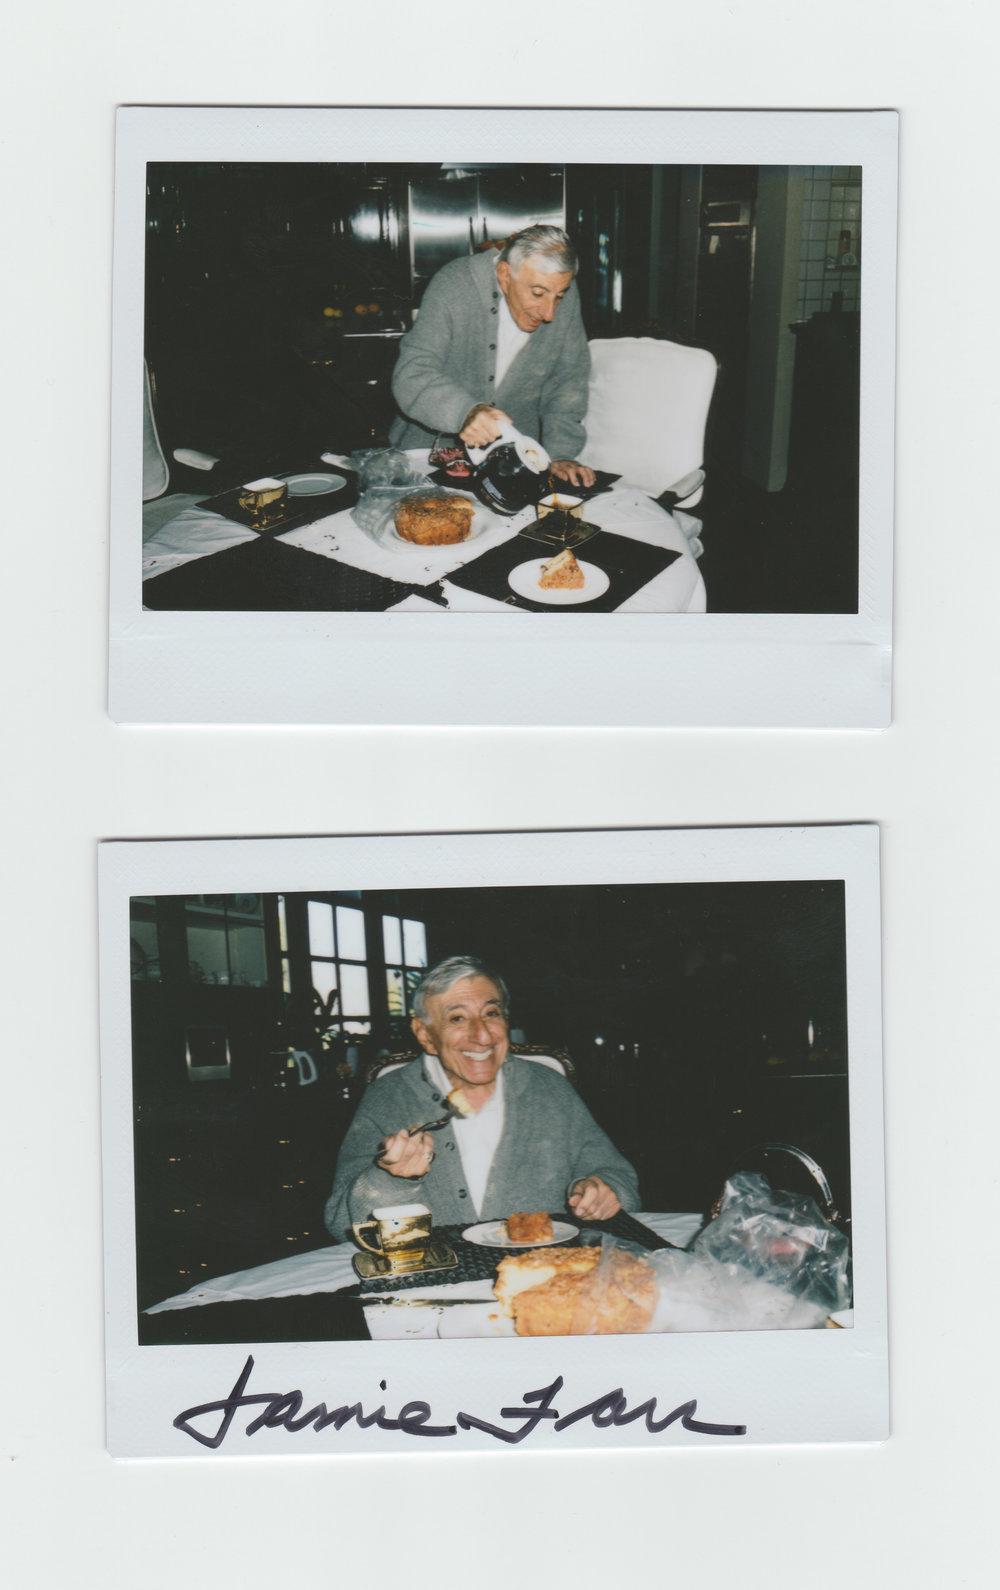 Jamie-Farr-Polaroids-1.jpg